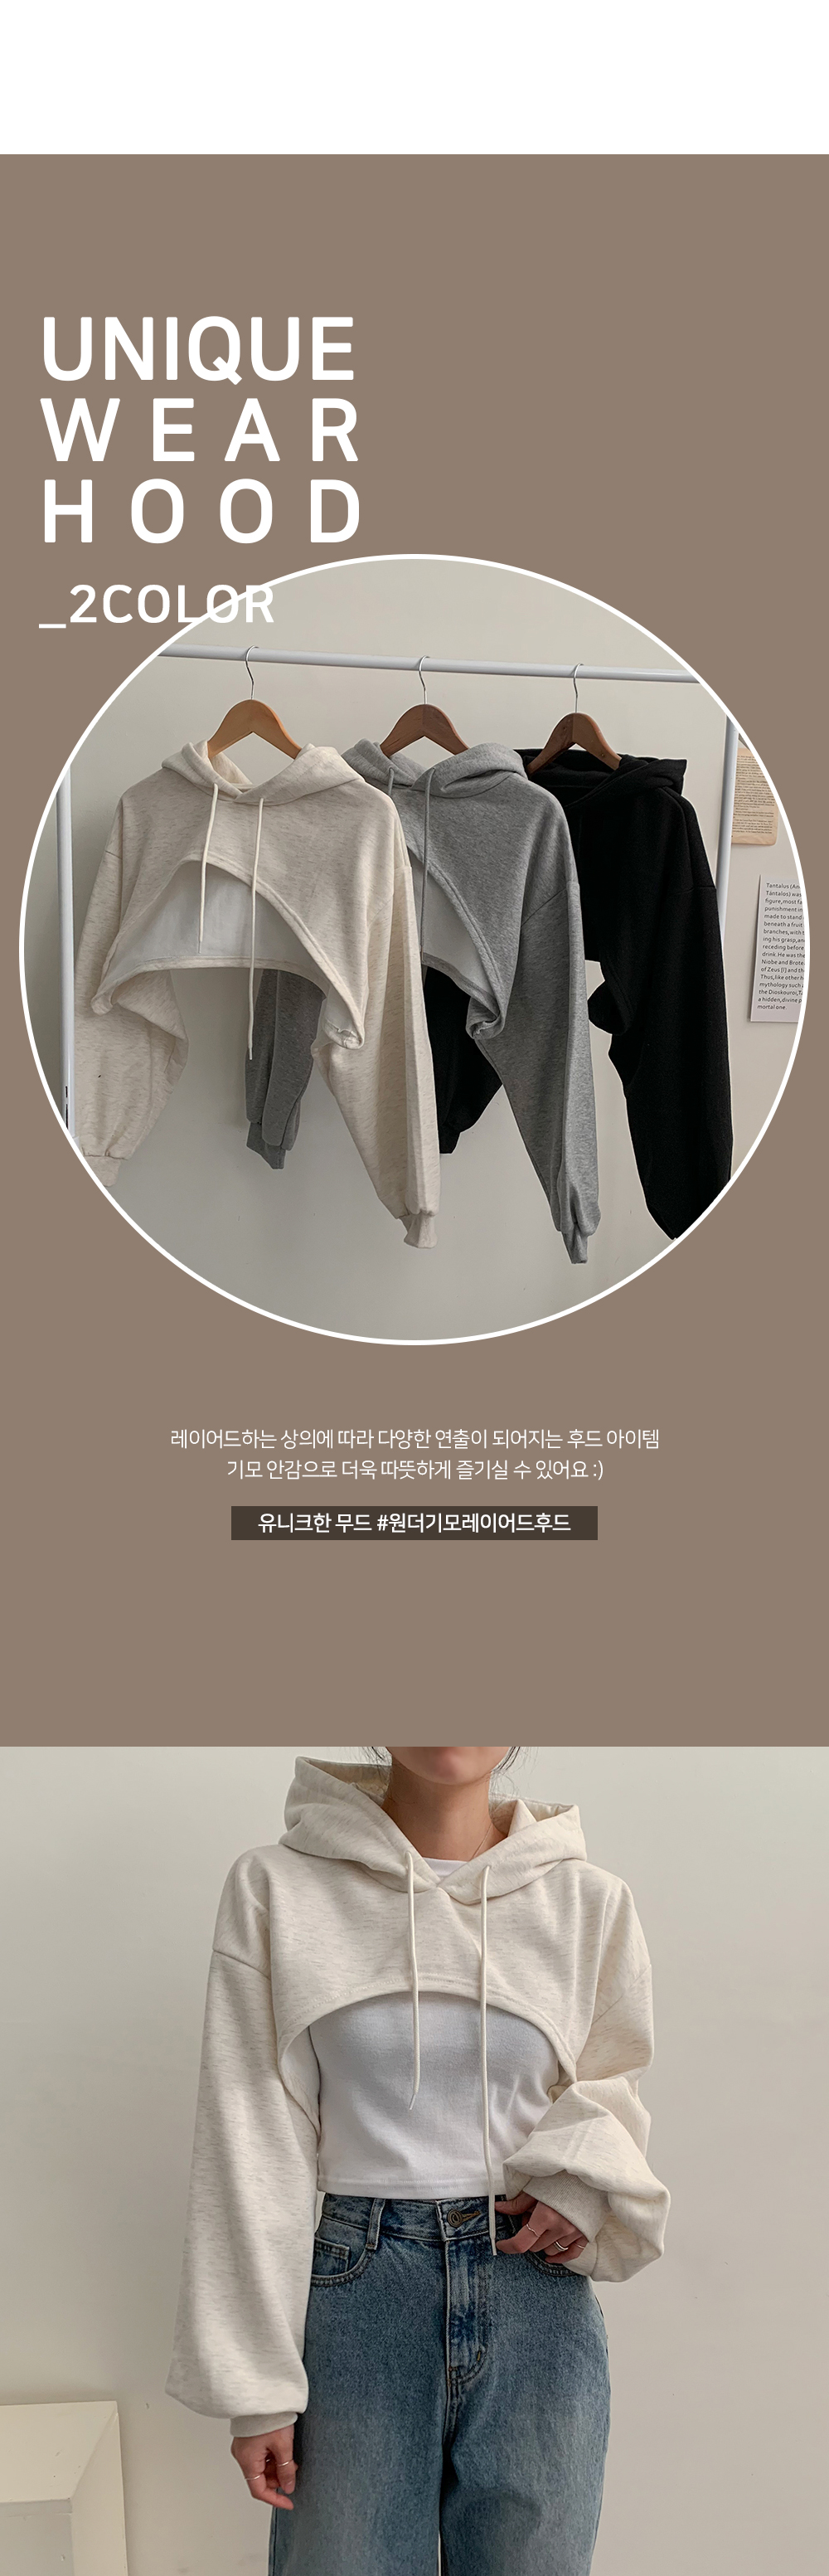 Wonder Fleece-lined layered hood